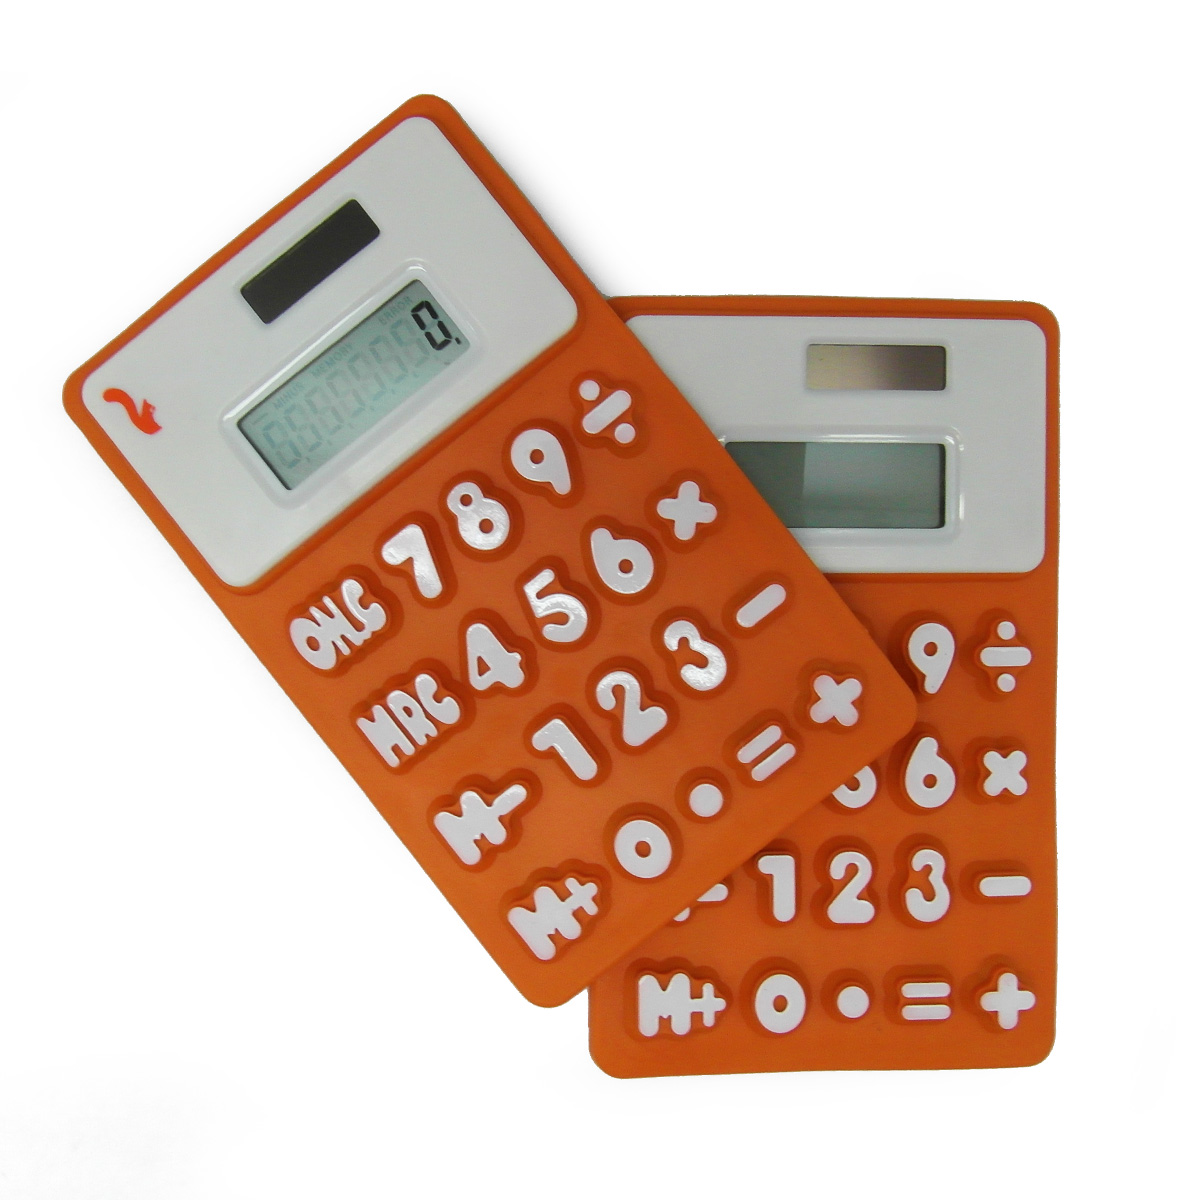 calcolatrice-festival-economia-trento-2016